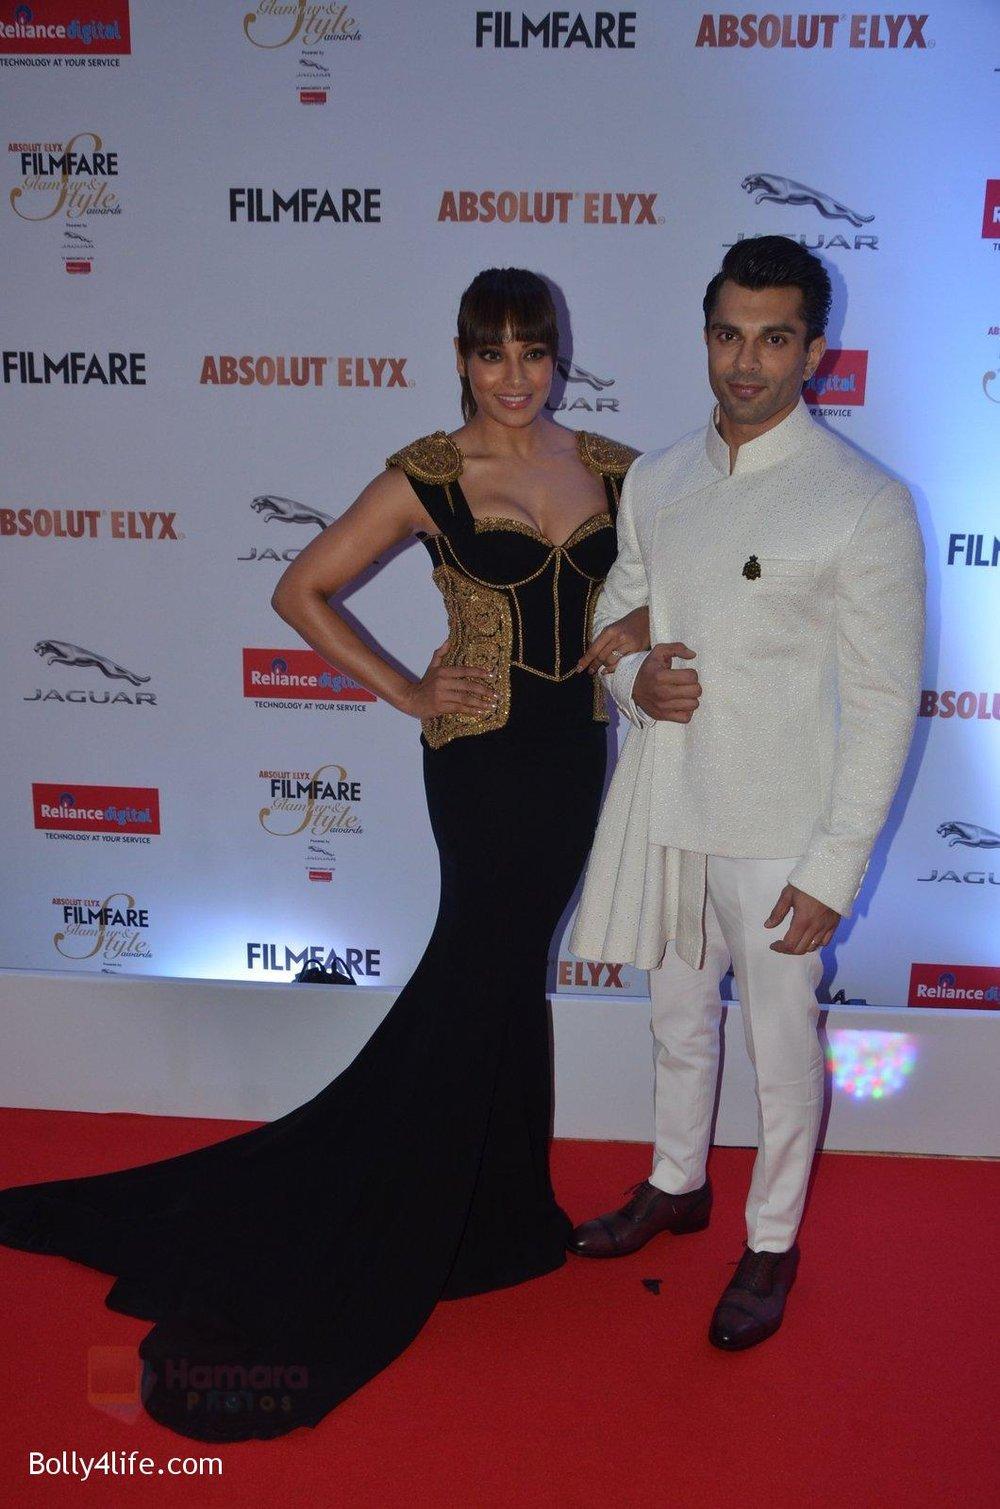 Bipasha-Basu-Karan-Singh-Grover-at-Filmfare-Glamour-Style-Awards-2016-in-Mumbai-on-15th-Oct-2016-1942.jpg